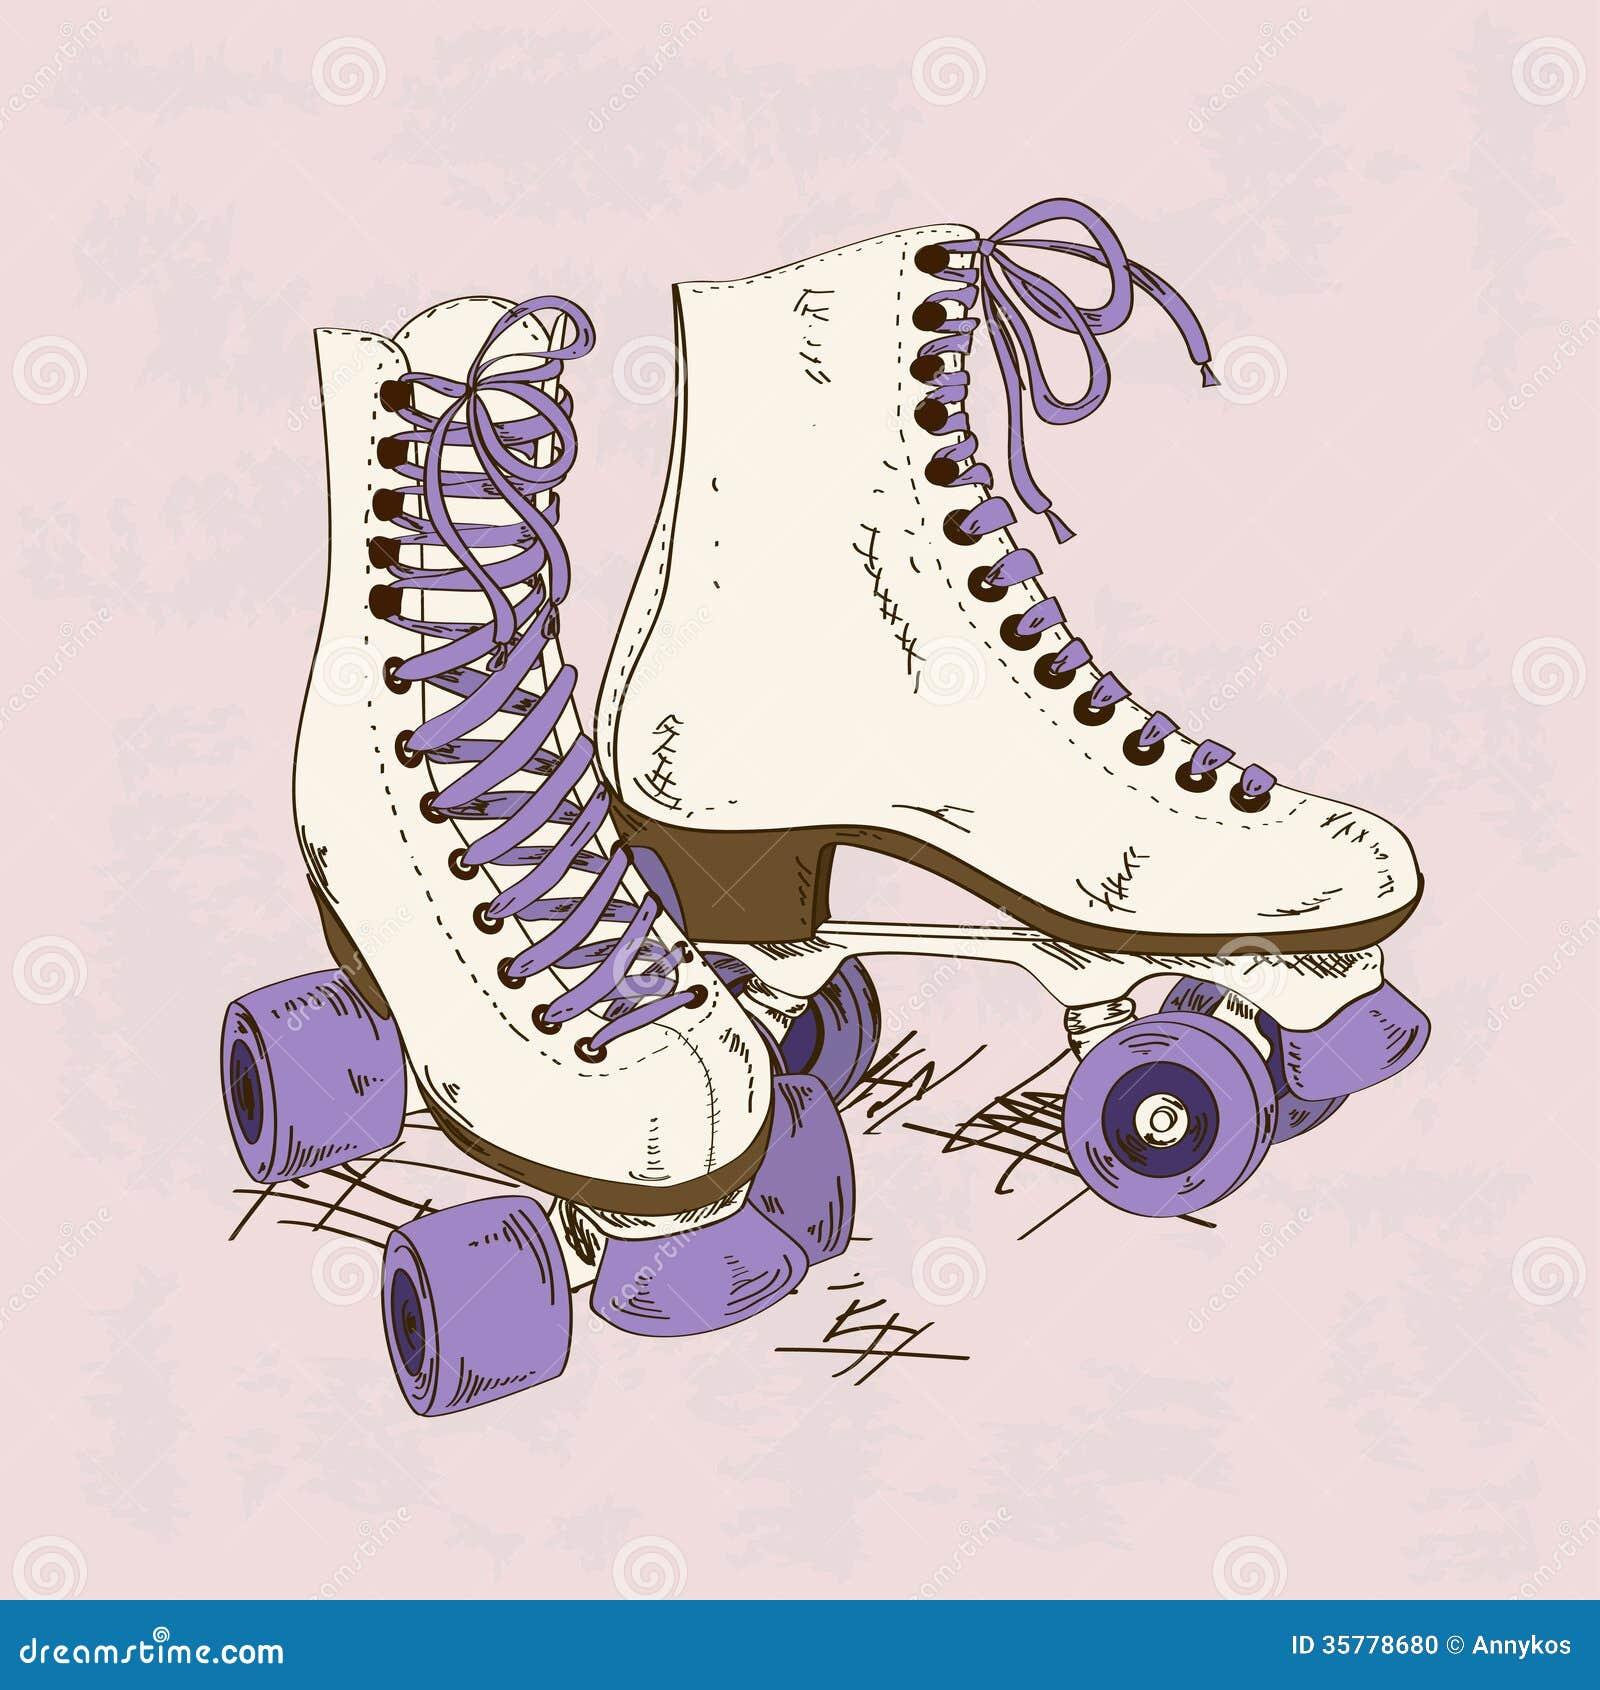 Roller skates in the 70s - Illustration With Retro Roller Skates Stock Photo